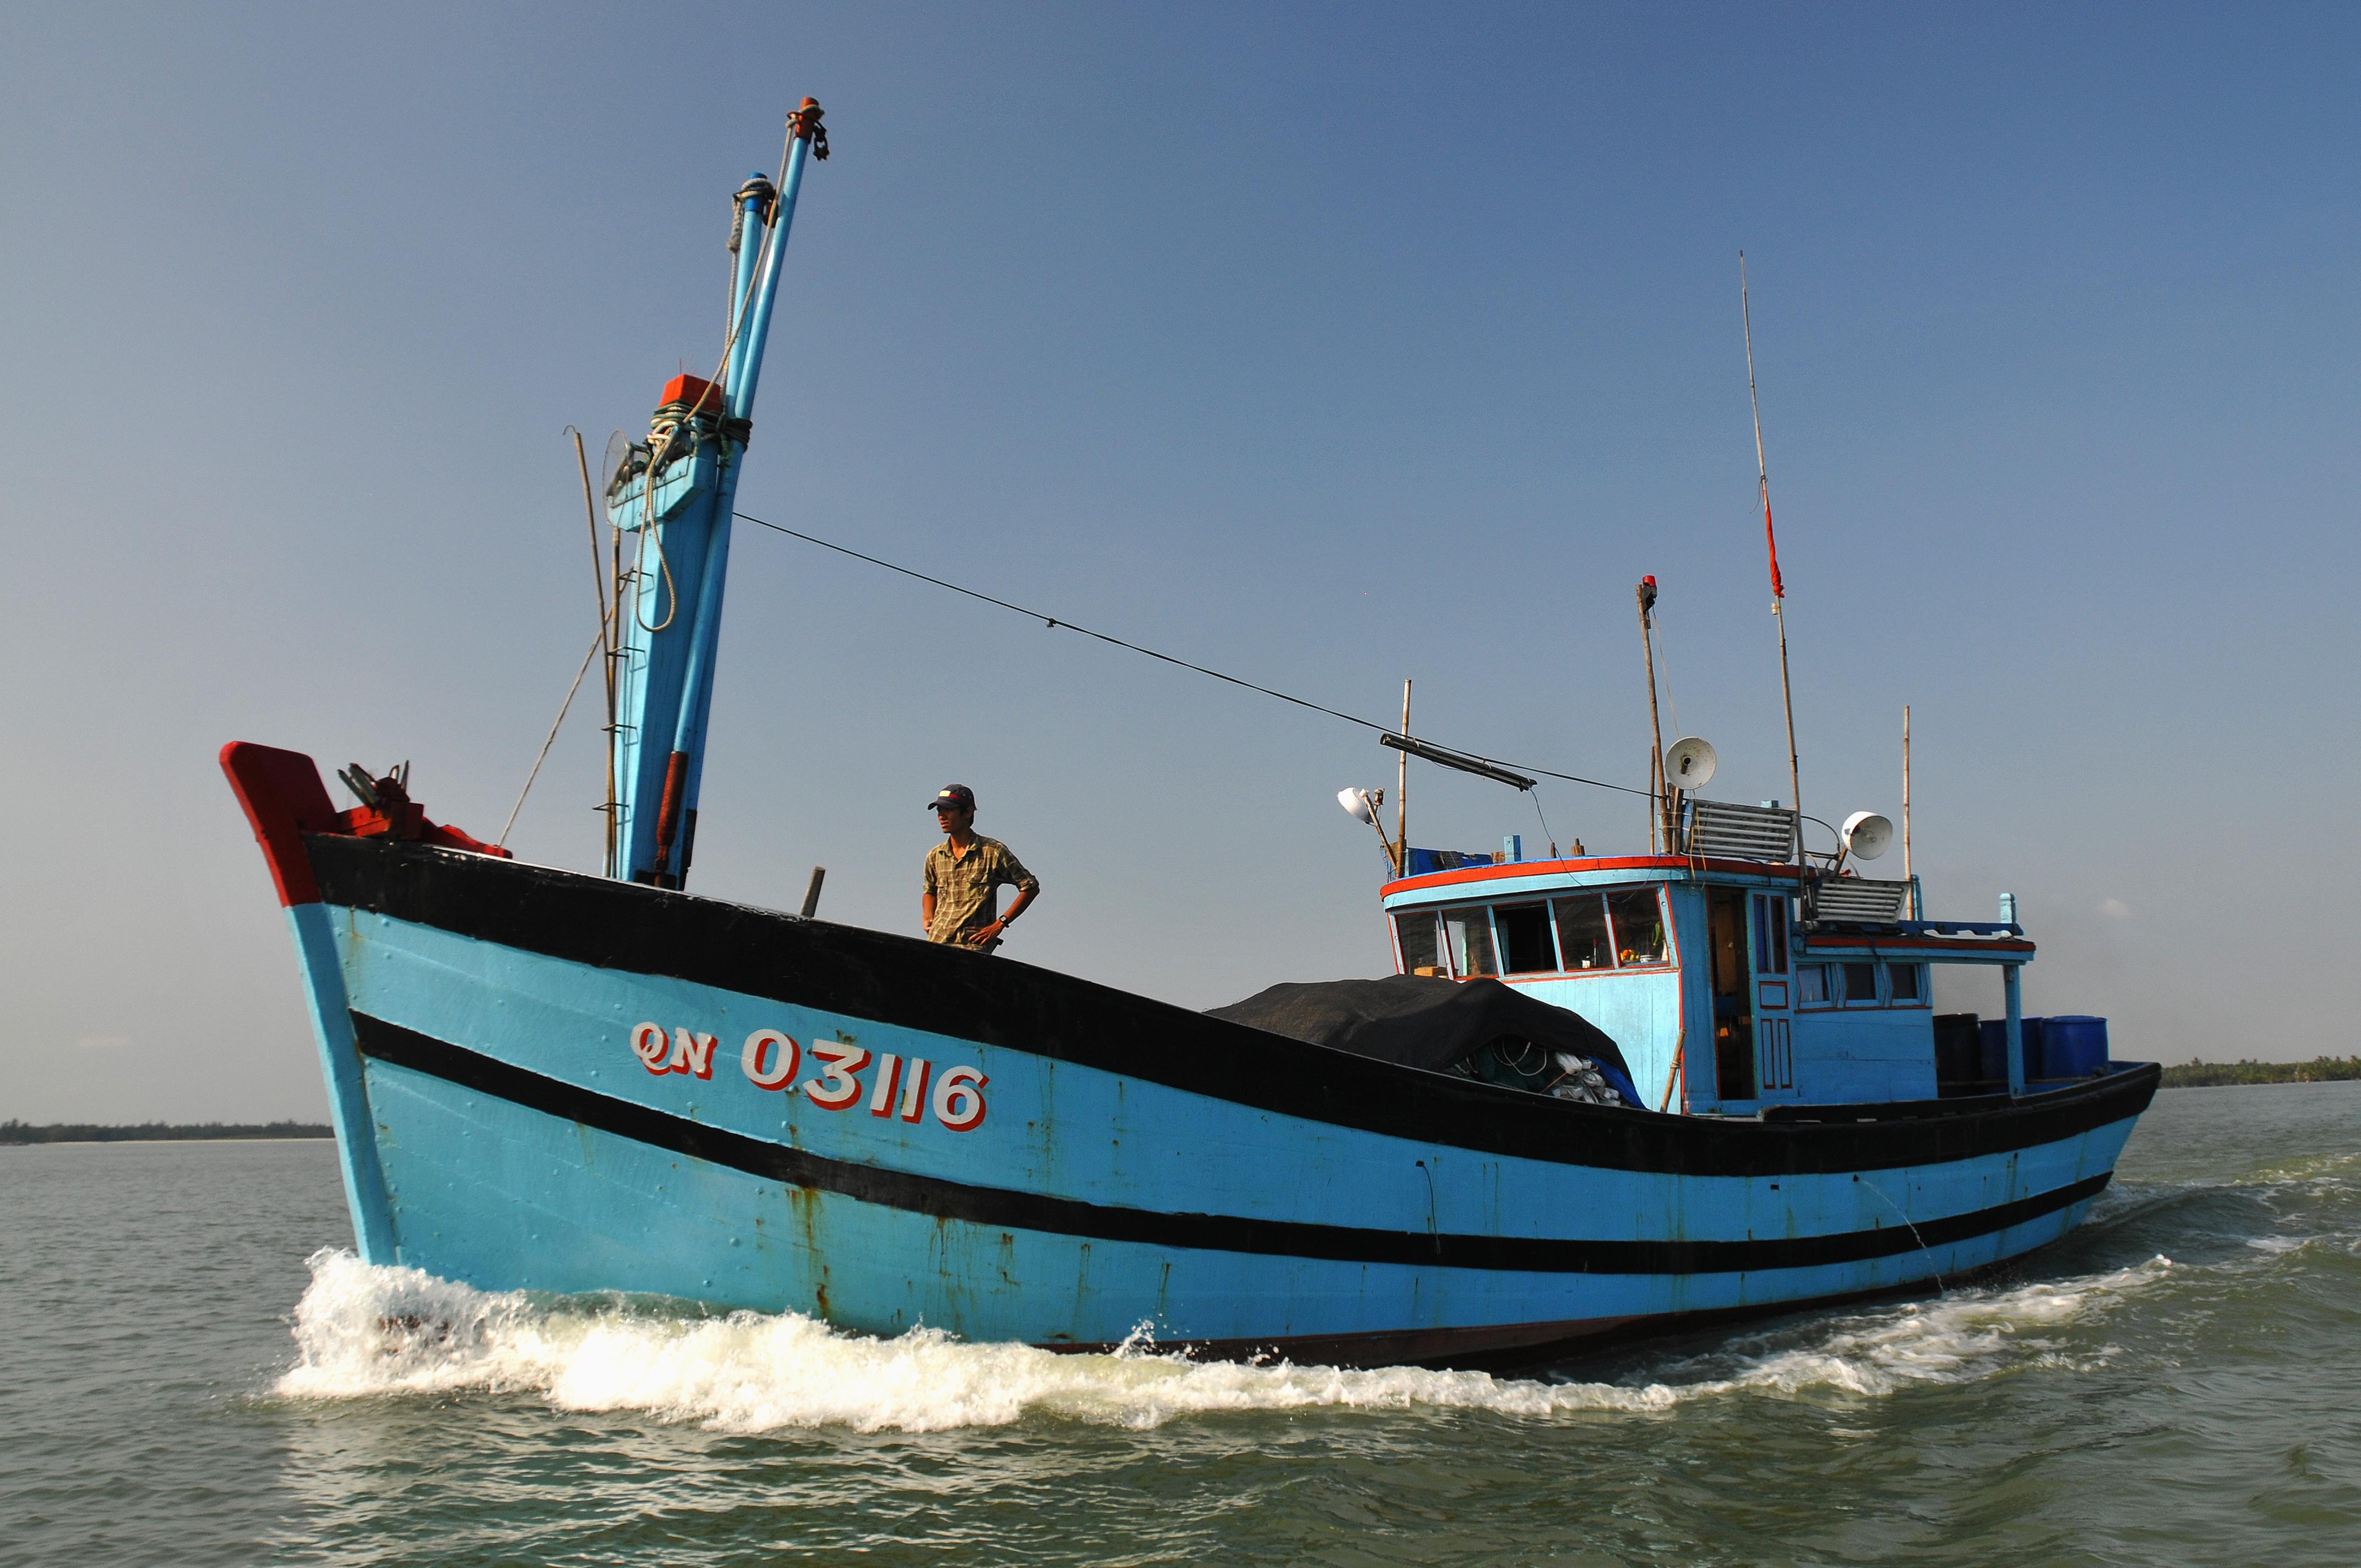 Description a fishing boat on the thu bon river, vietnam